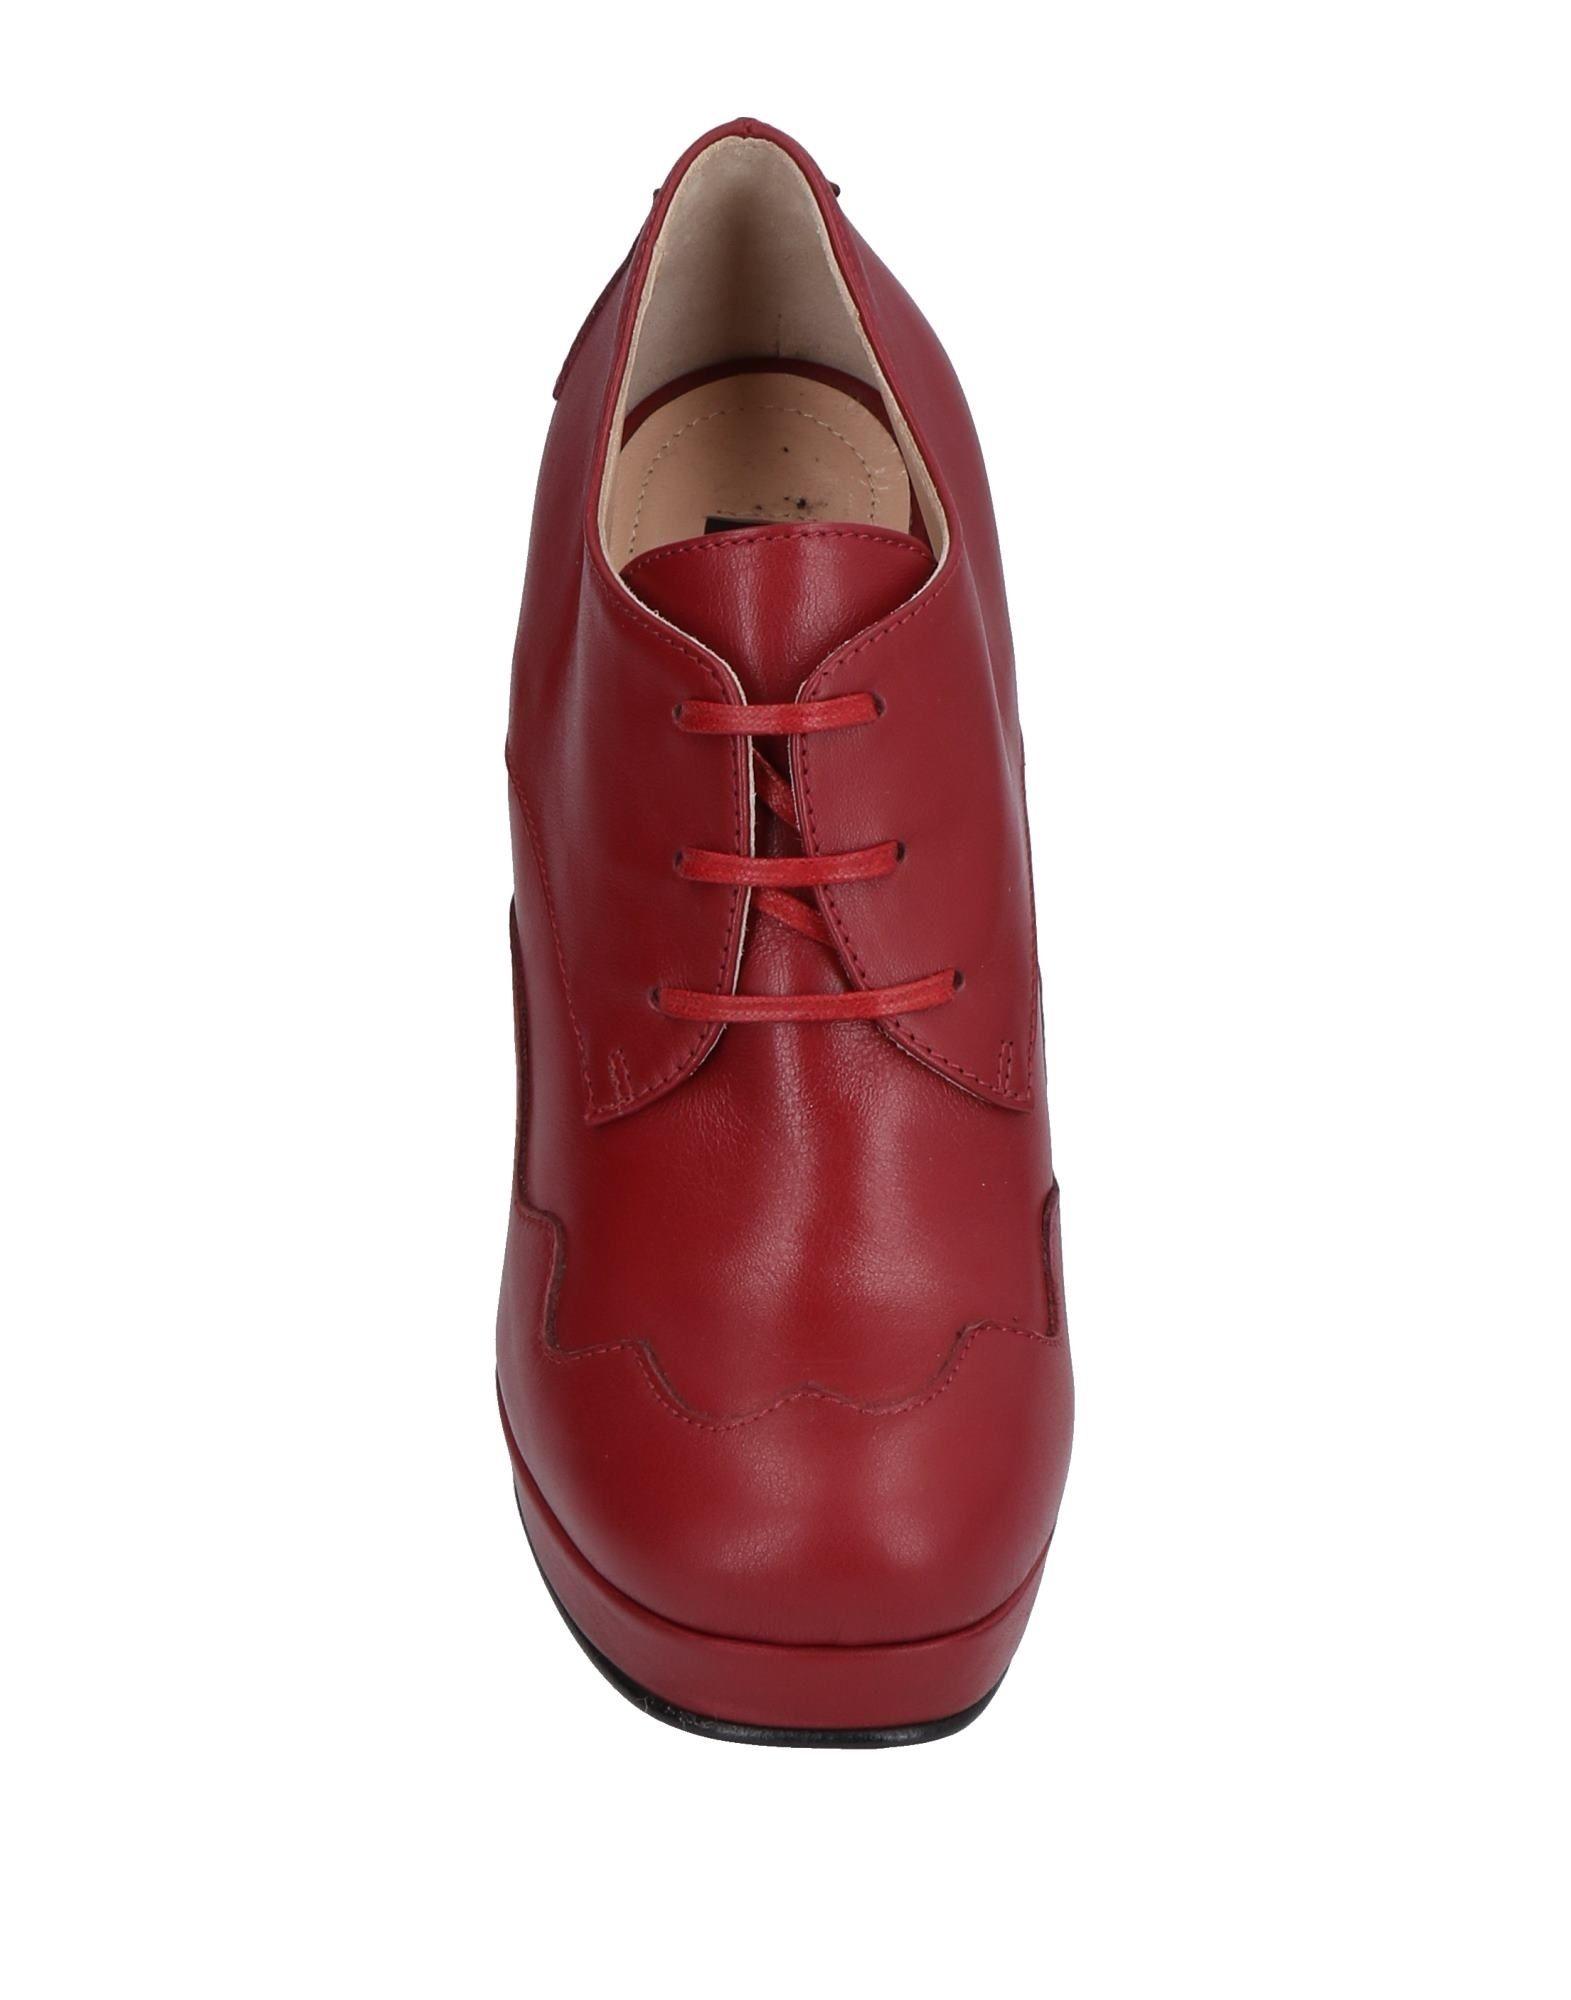 Stilvolle Pinko billige Schuhe Pinko Stilvolle Schnürschuhe Damen  11522822QB 9b75e8